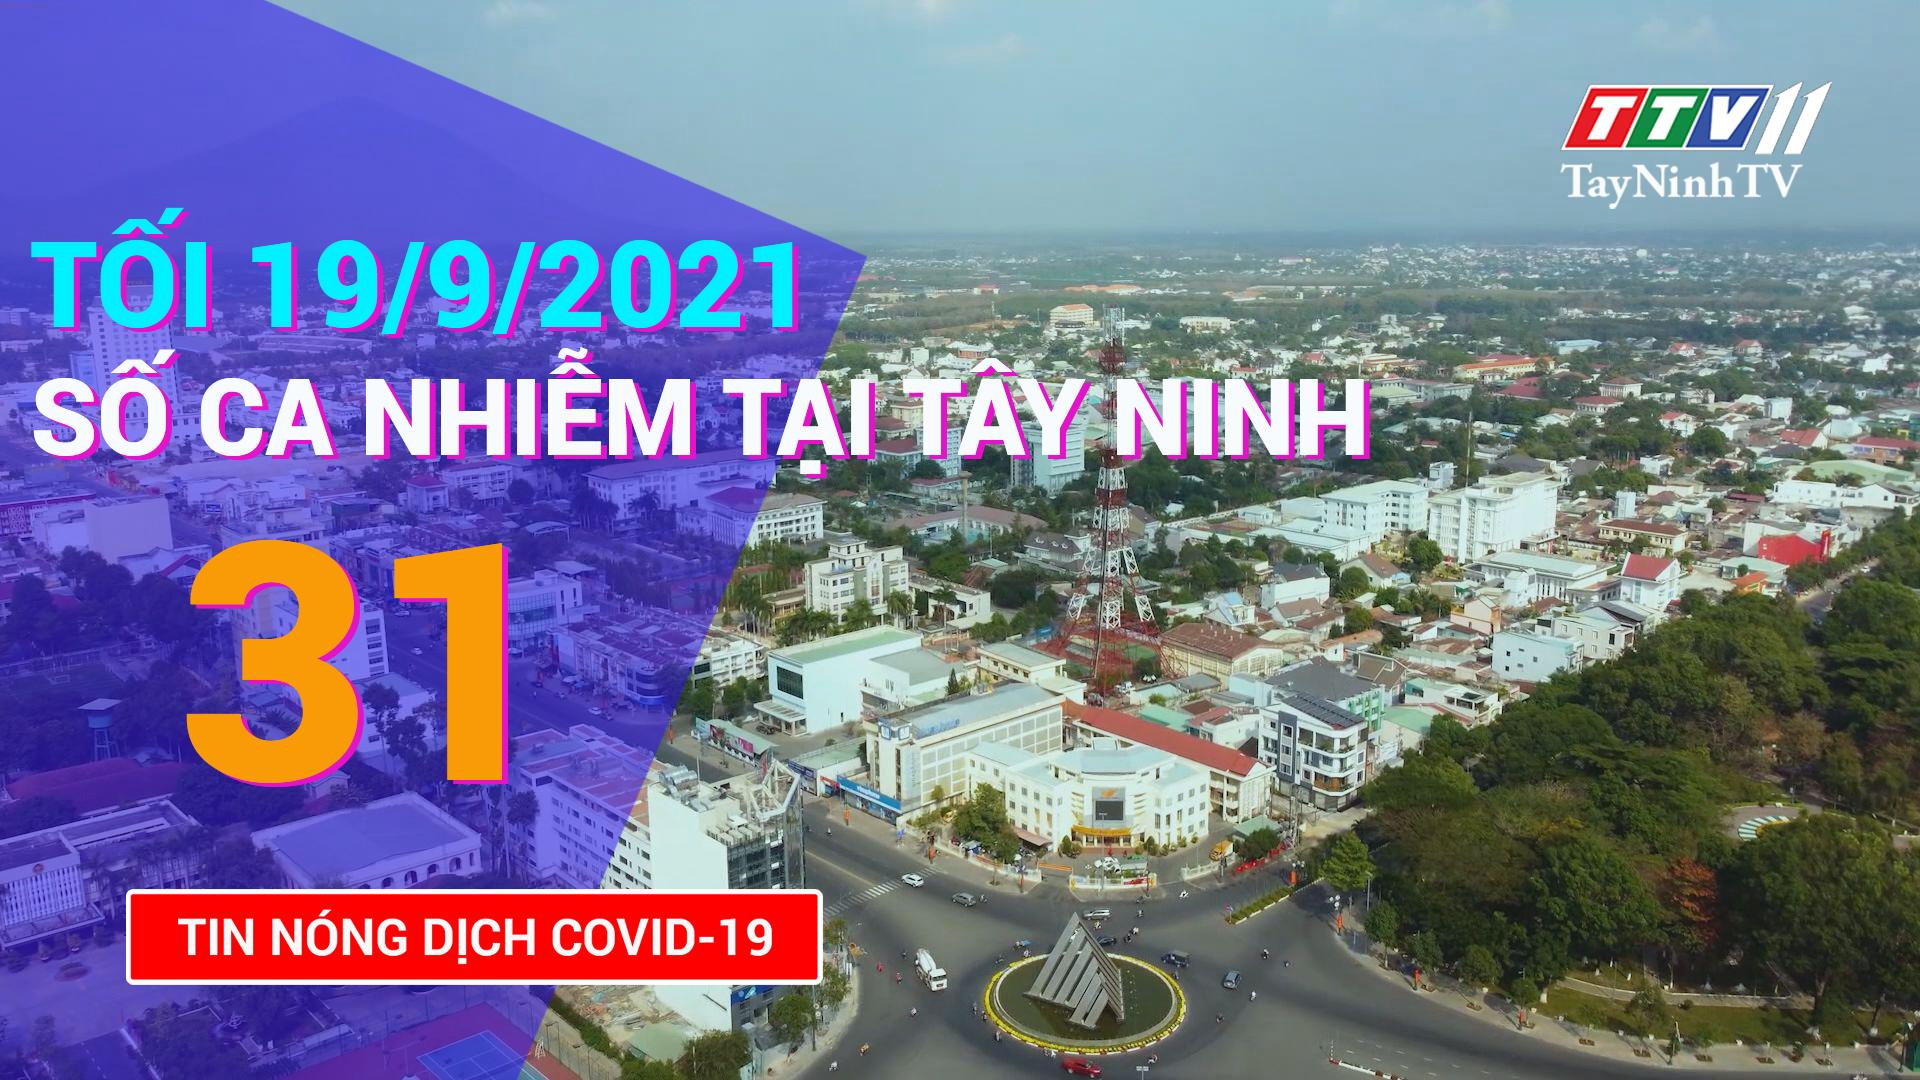 Tin tức Covid-19 tối 19/9/2021 | TayNinhTV